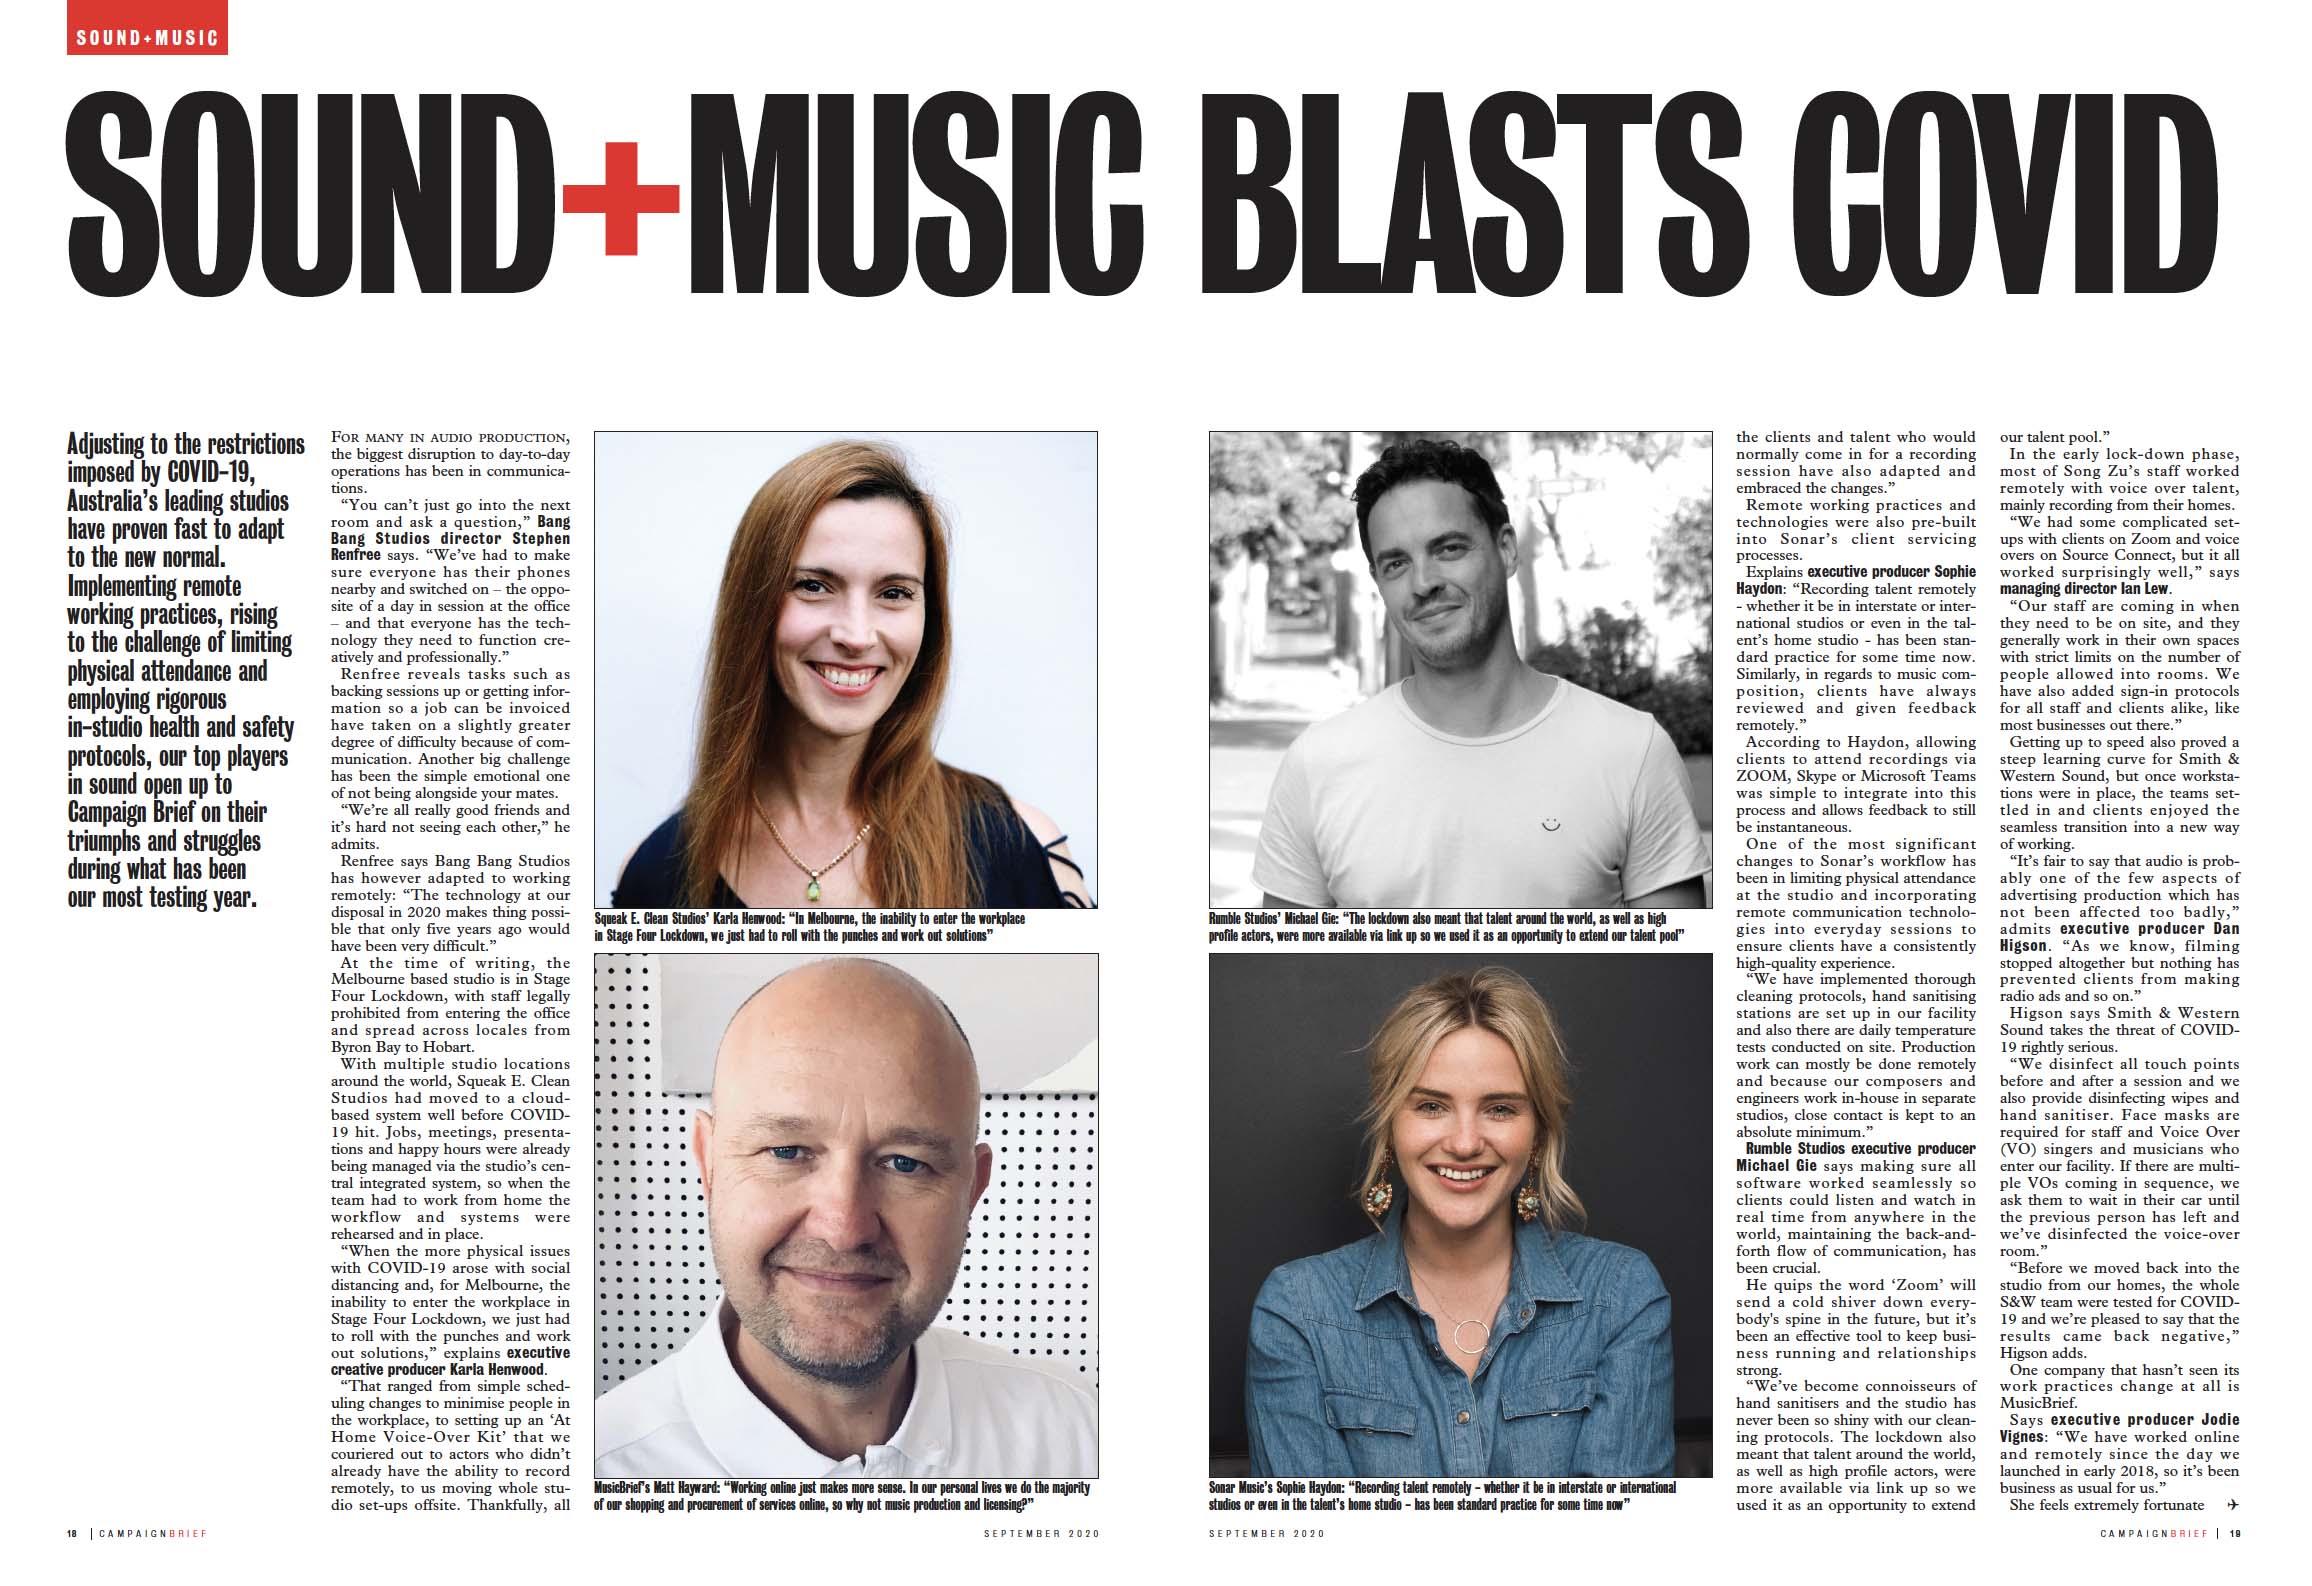 CB REPORT ~ SOUND+MUSIC INDUSTRY BLASTSCOVID